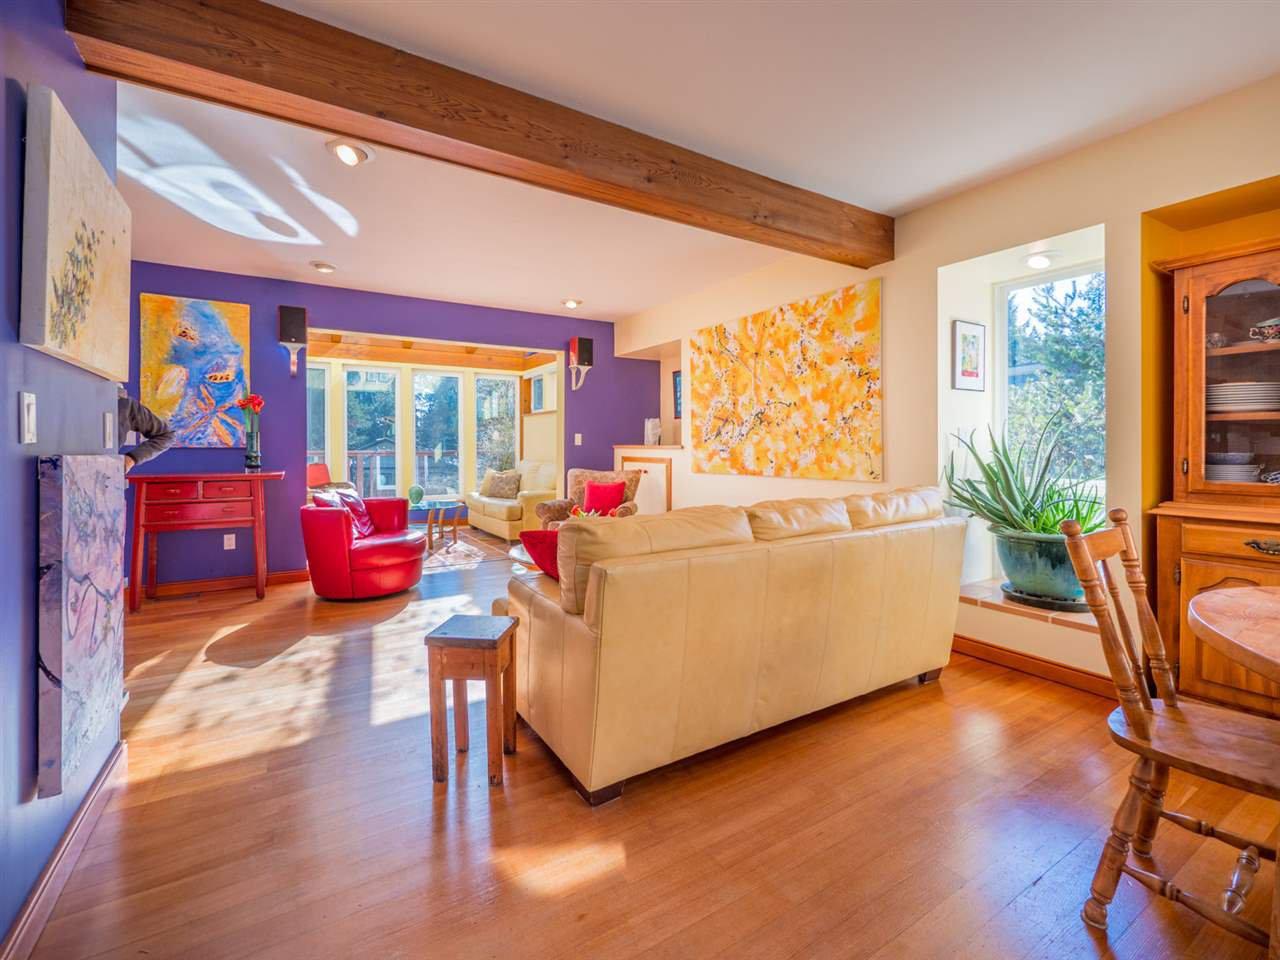 Photo 3: Photos: 3592 BEACH Avenue: Roberts Creek House for sale (Sunshine Coast)  : MLS®# R2244747